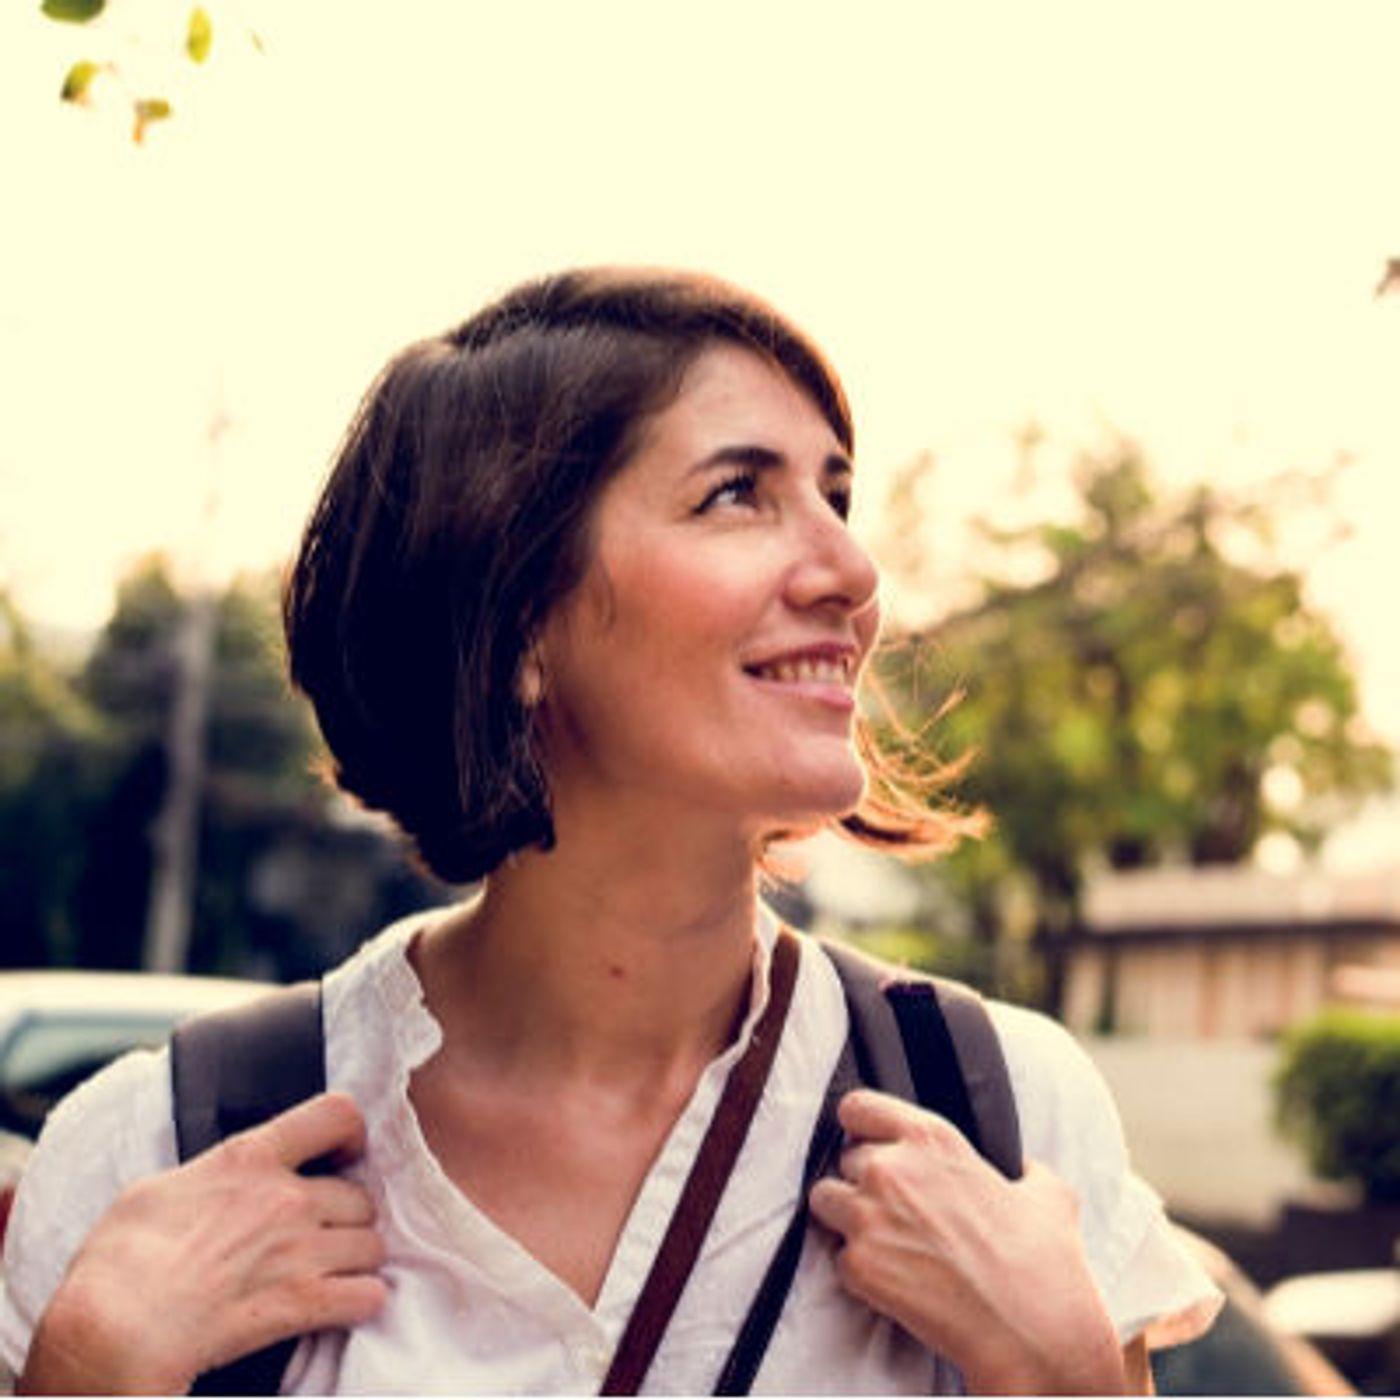 Conversations About Divorce - Traveling Solo After Divorce